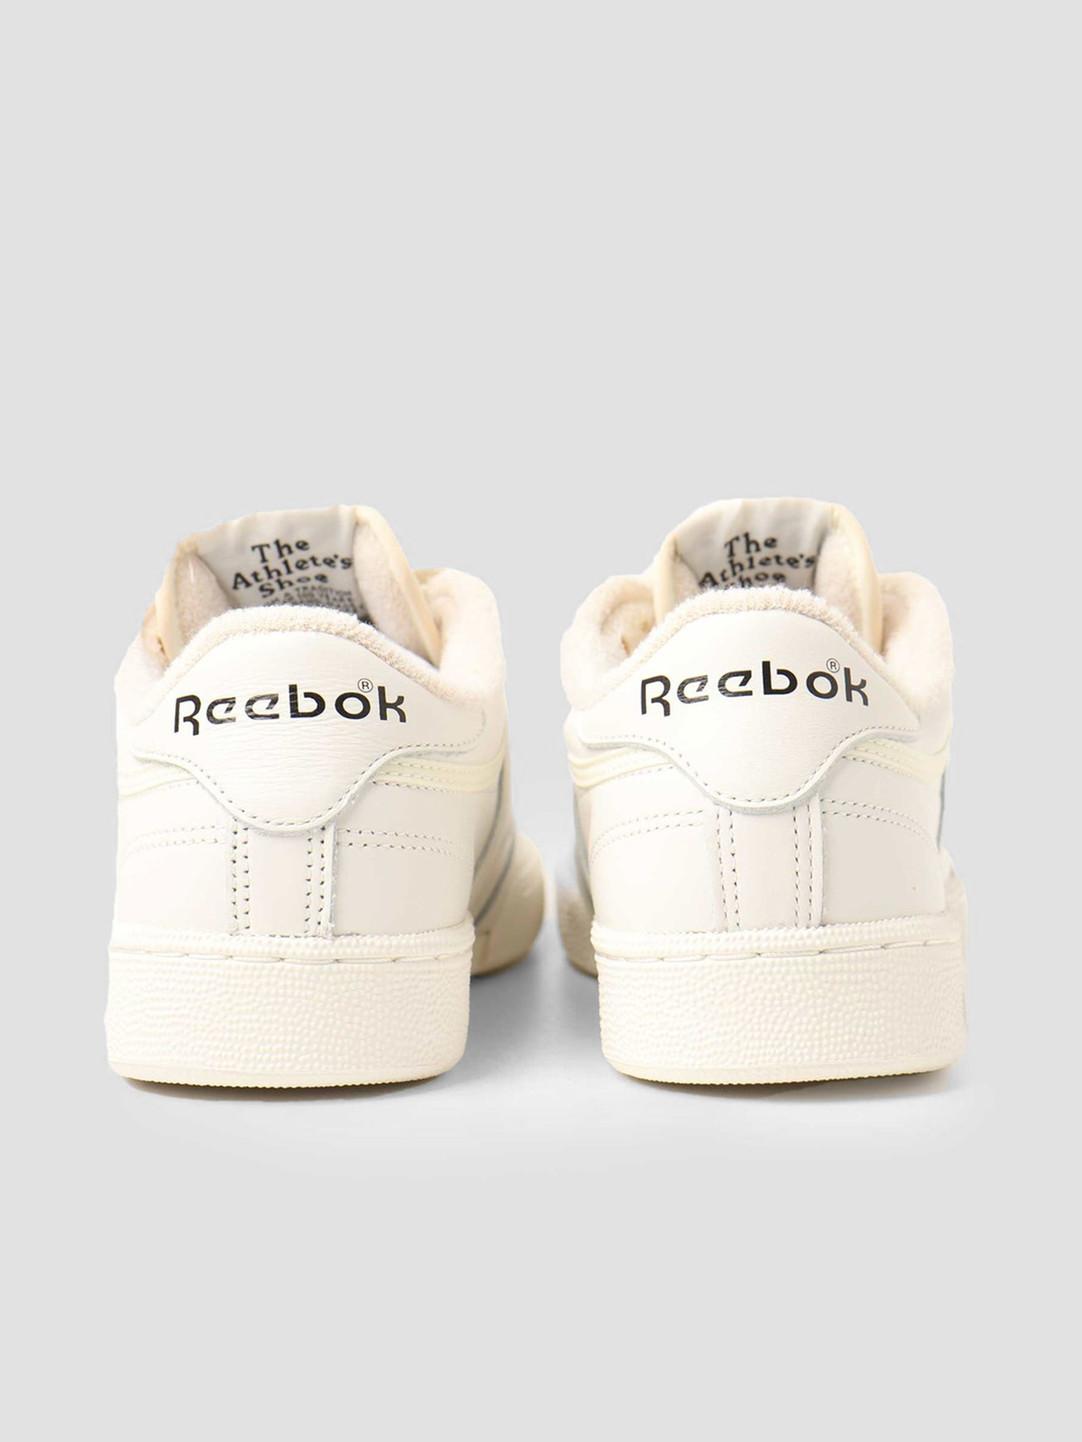 Reebok Reebok Club C 1985 TV Chalk Black GY4966